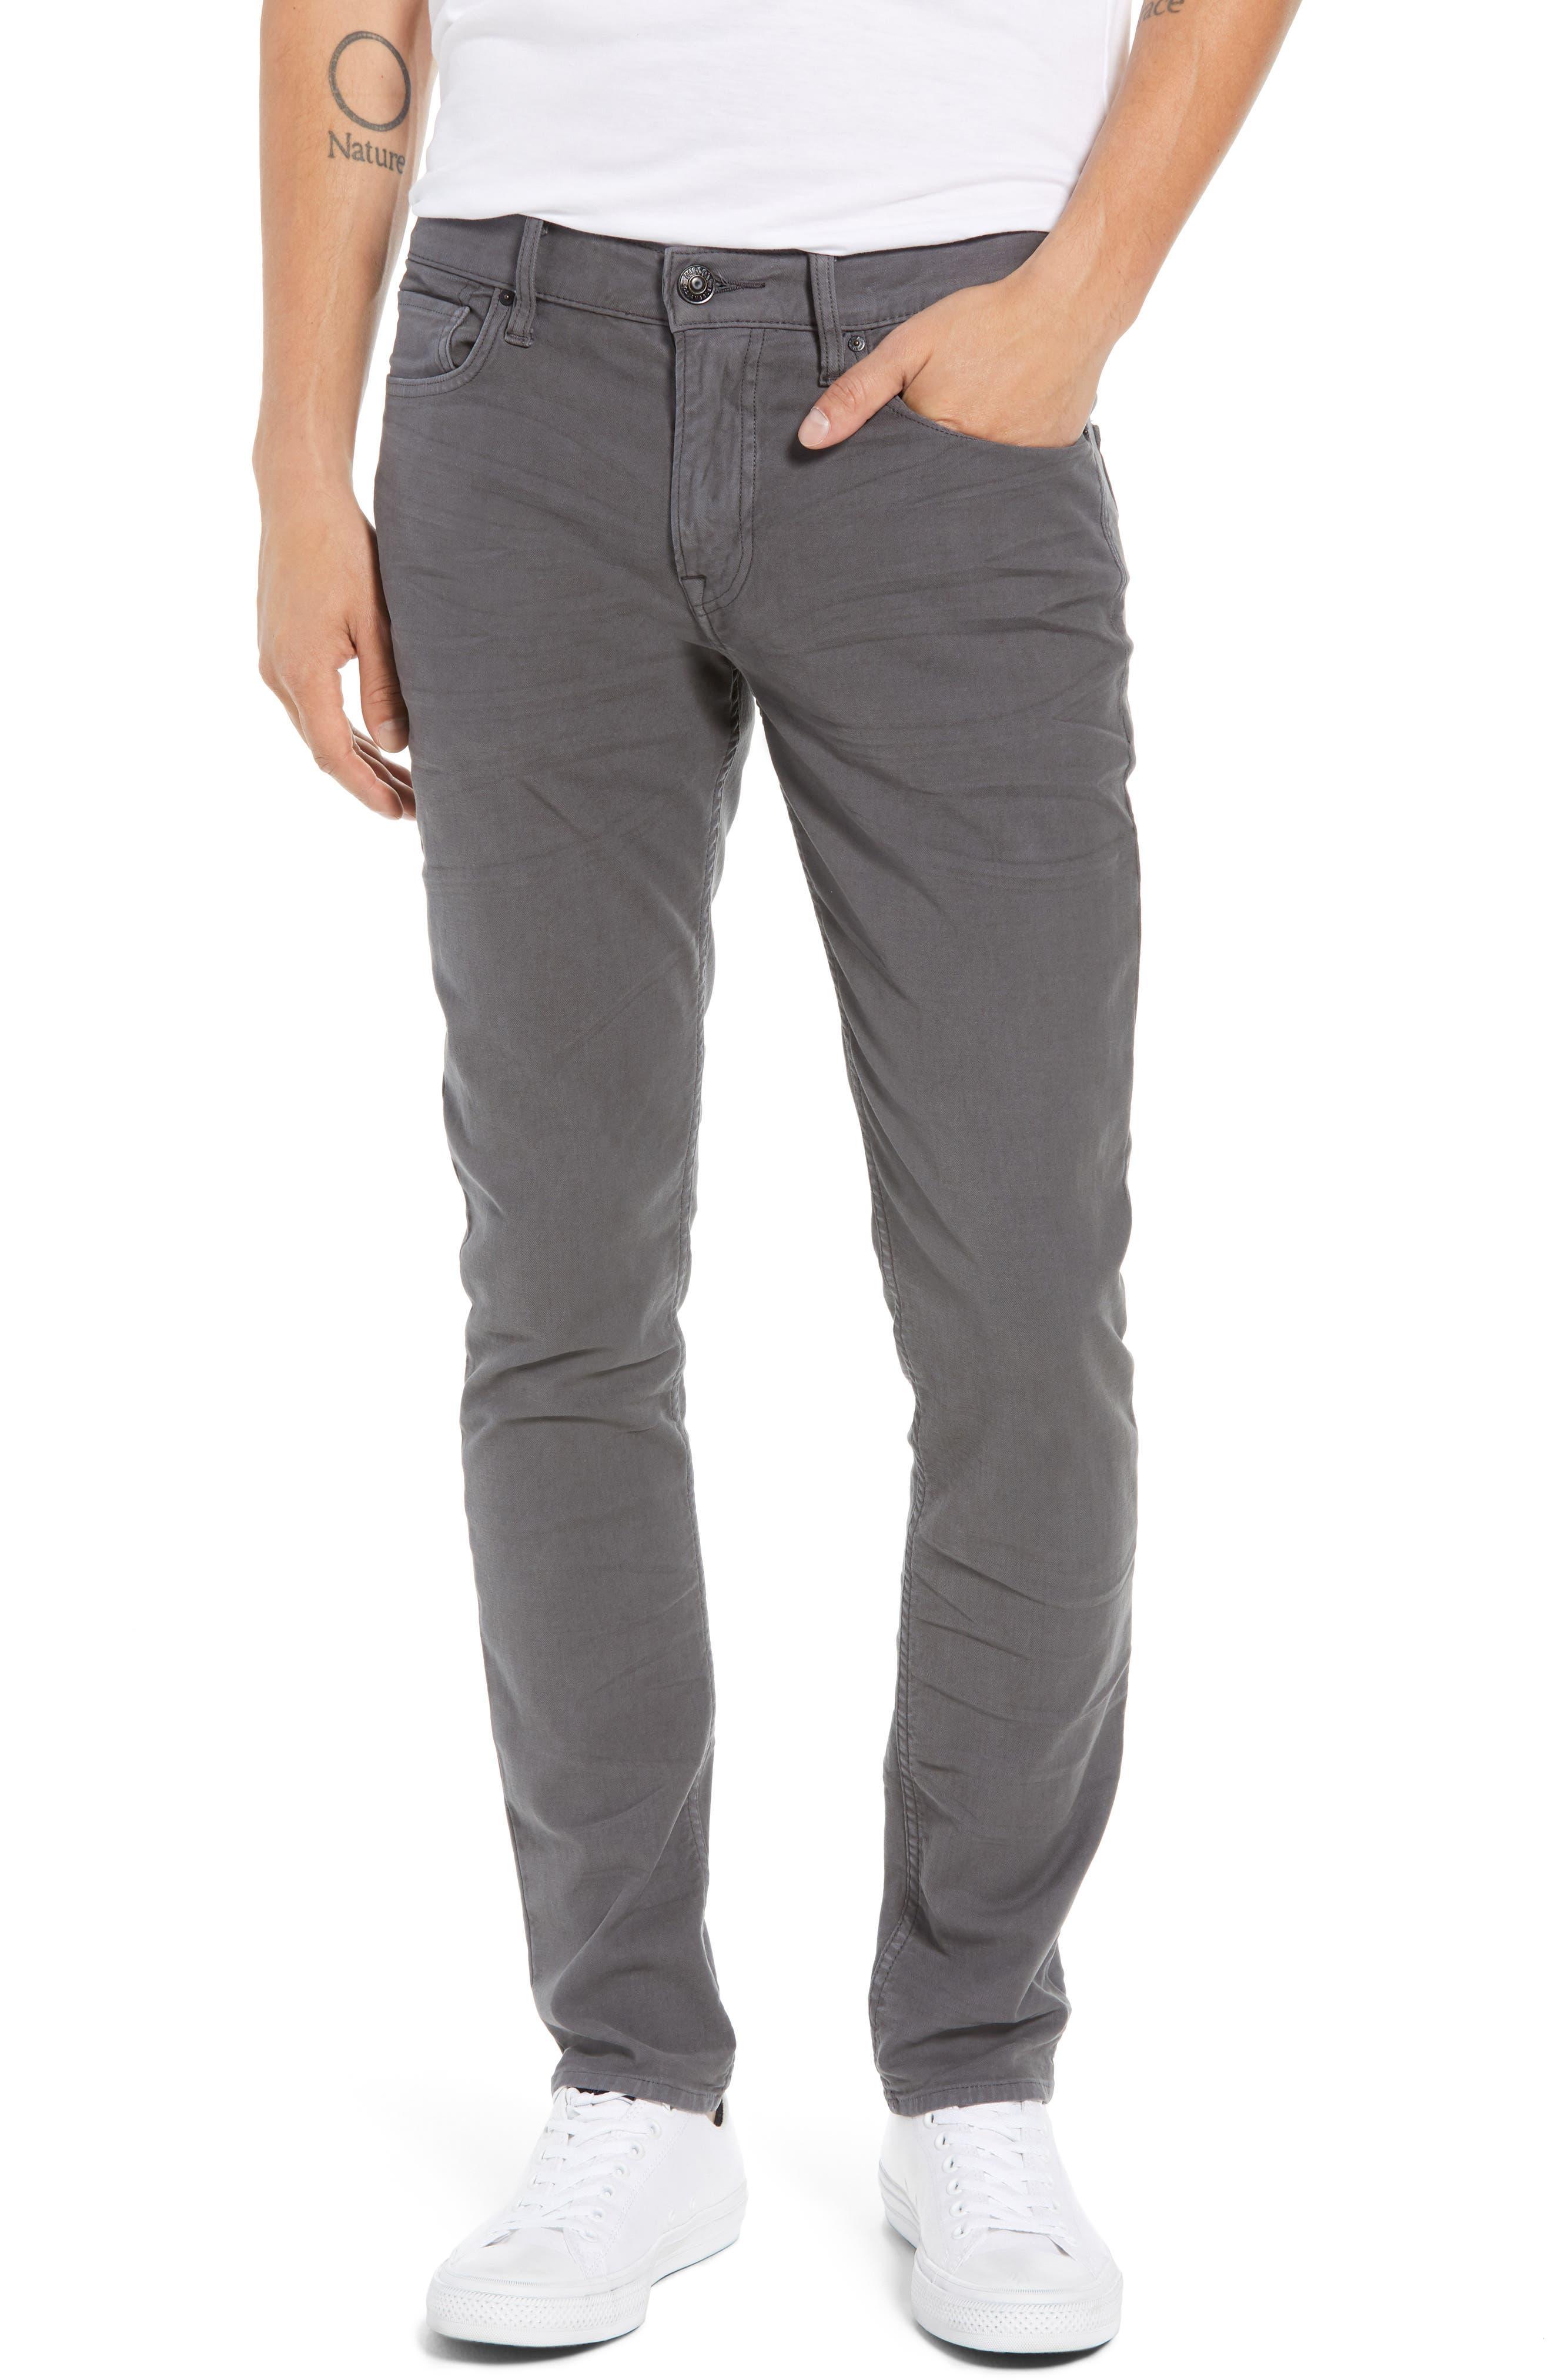 Hudson Axl Skinny Fit Jeans,                             Main thumbnail 1, color,                             GRAPHITE